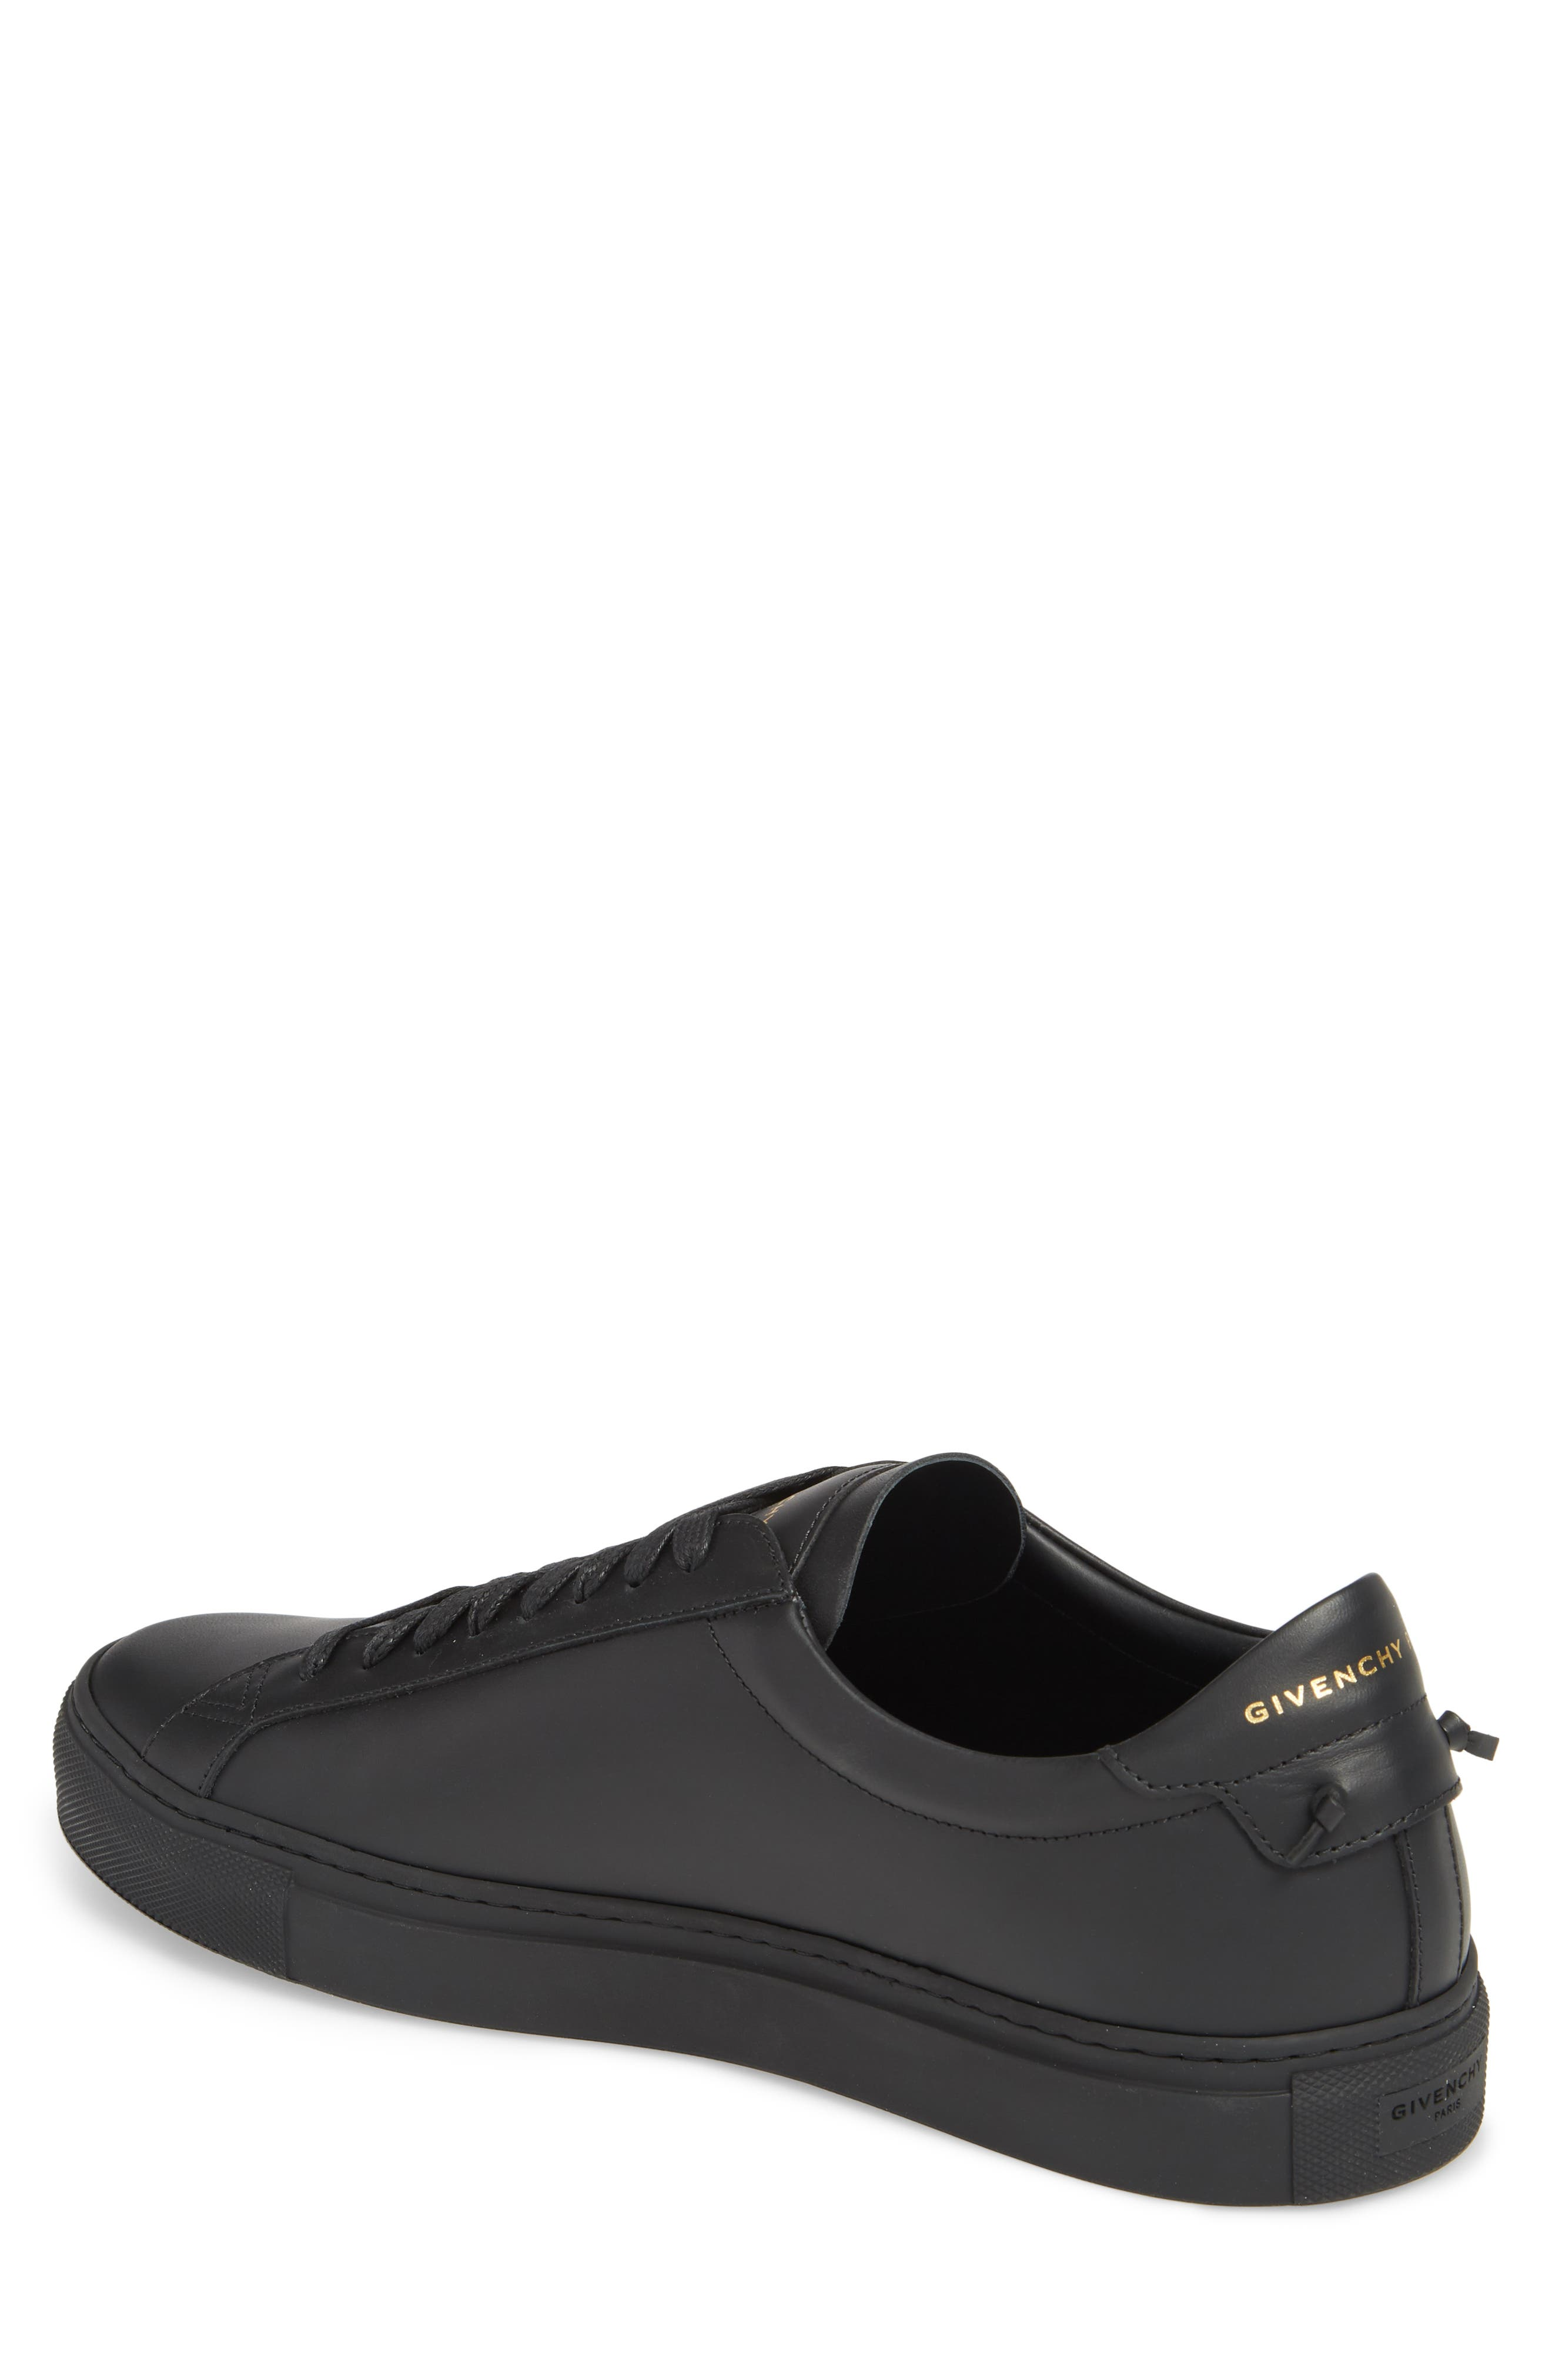 'Urban Knots Lo' Sneaker,                             Alternate thumbnail 2, color,                             Black